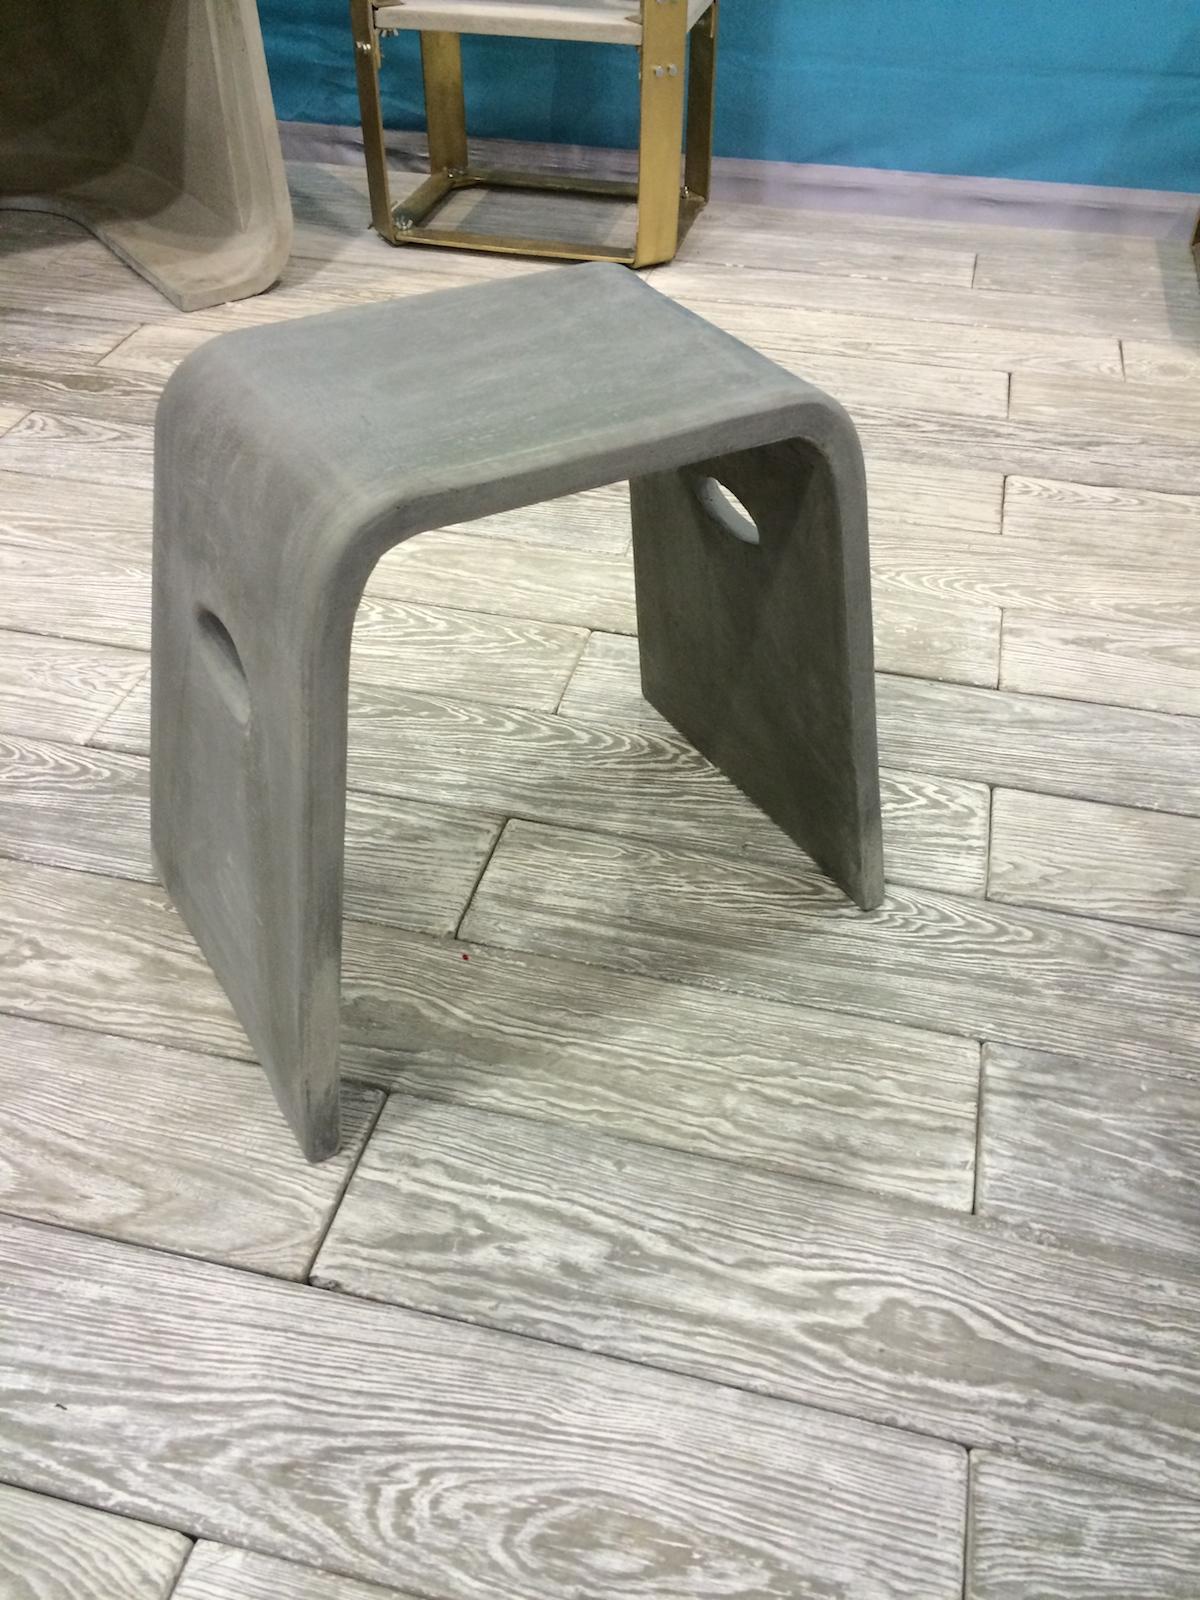 jorge-diego-etienne-maz-y-mas-concrete-design-03.jpg